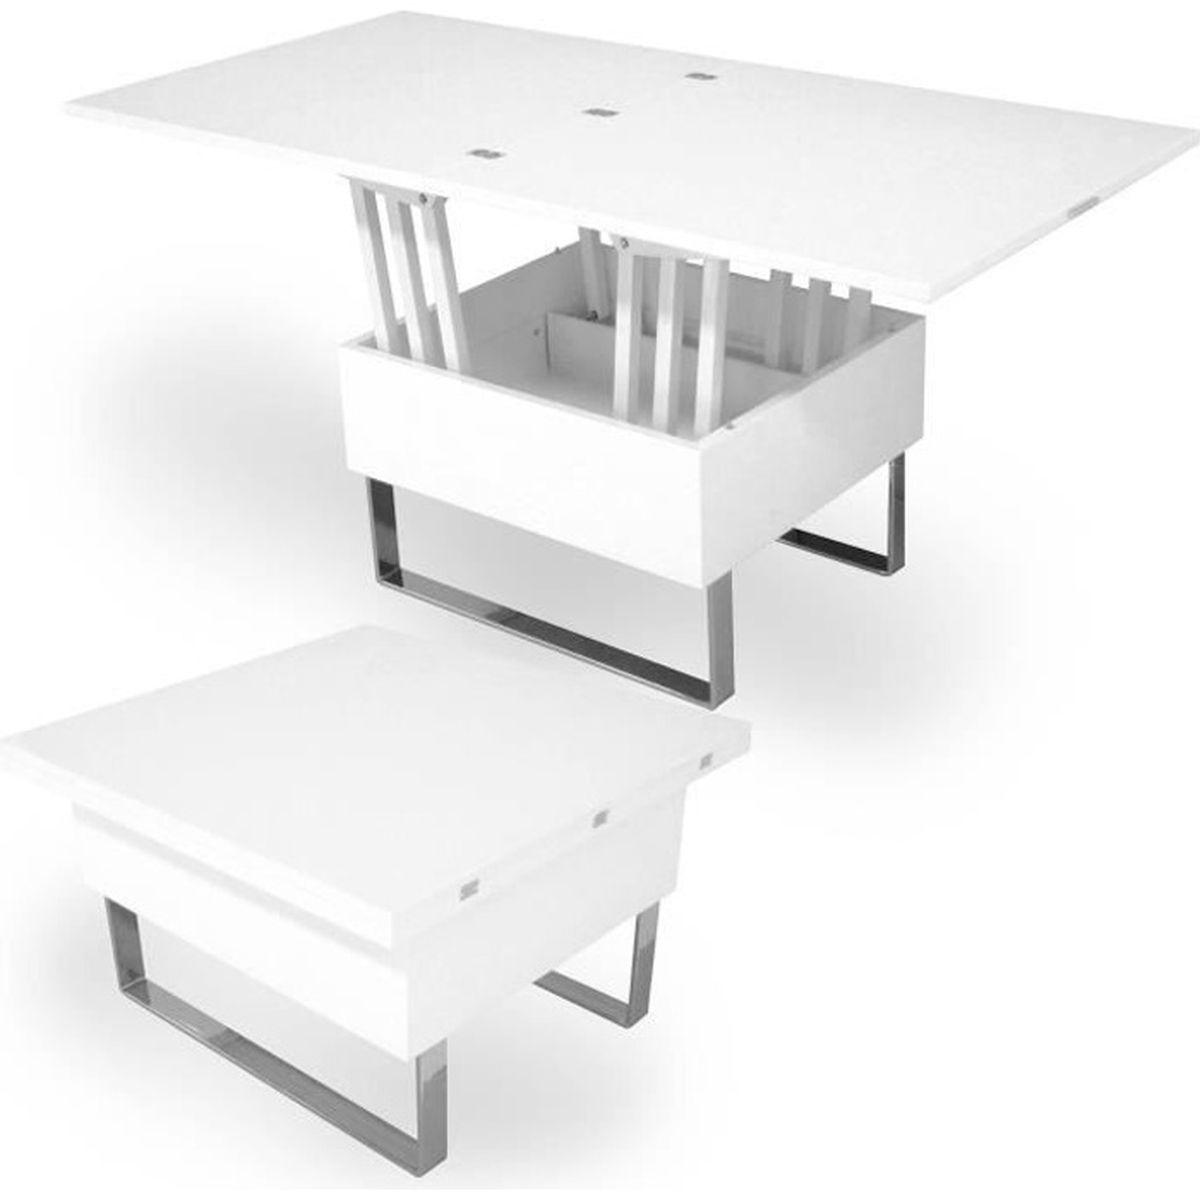 basse Table multifonction basse Table basse multifonction relevable relevable Table Table relevable basse multifonction FulK3Tc1J